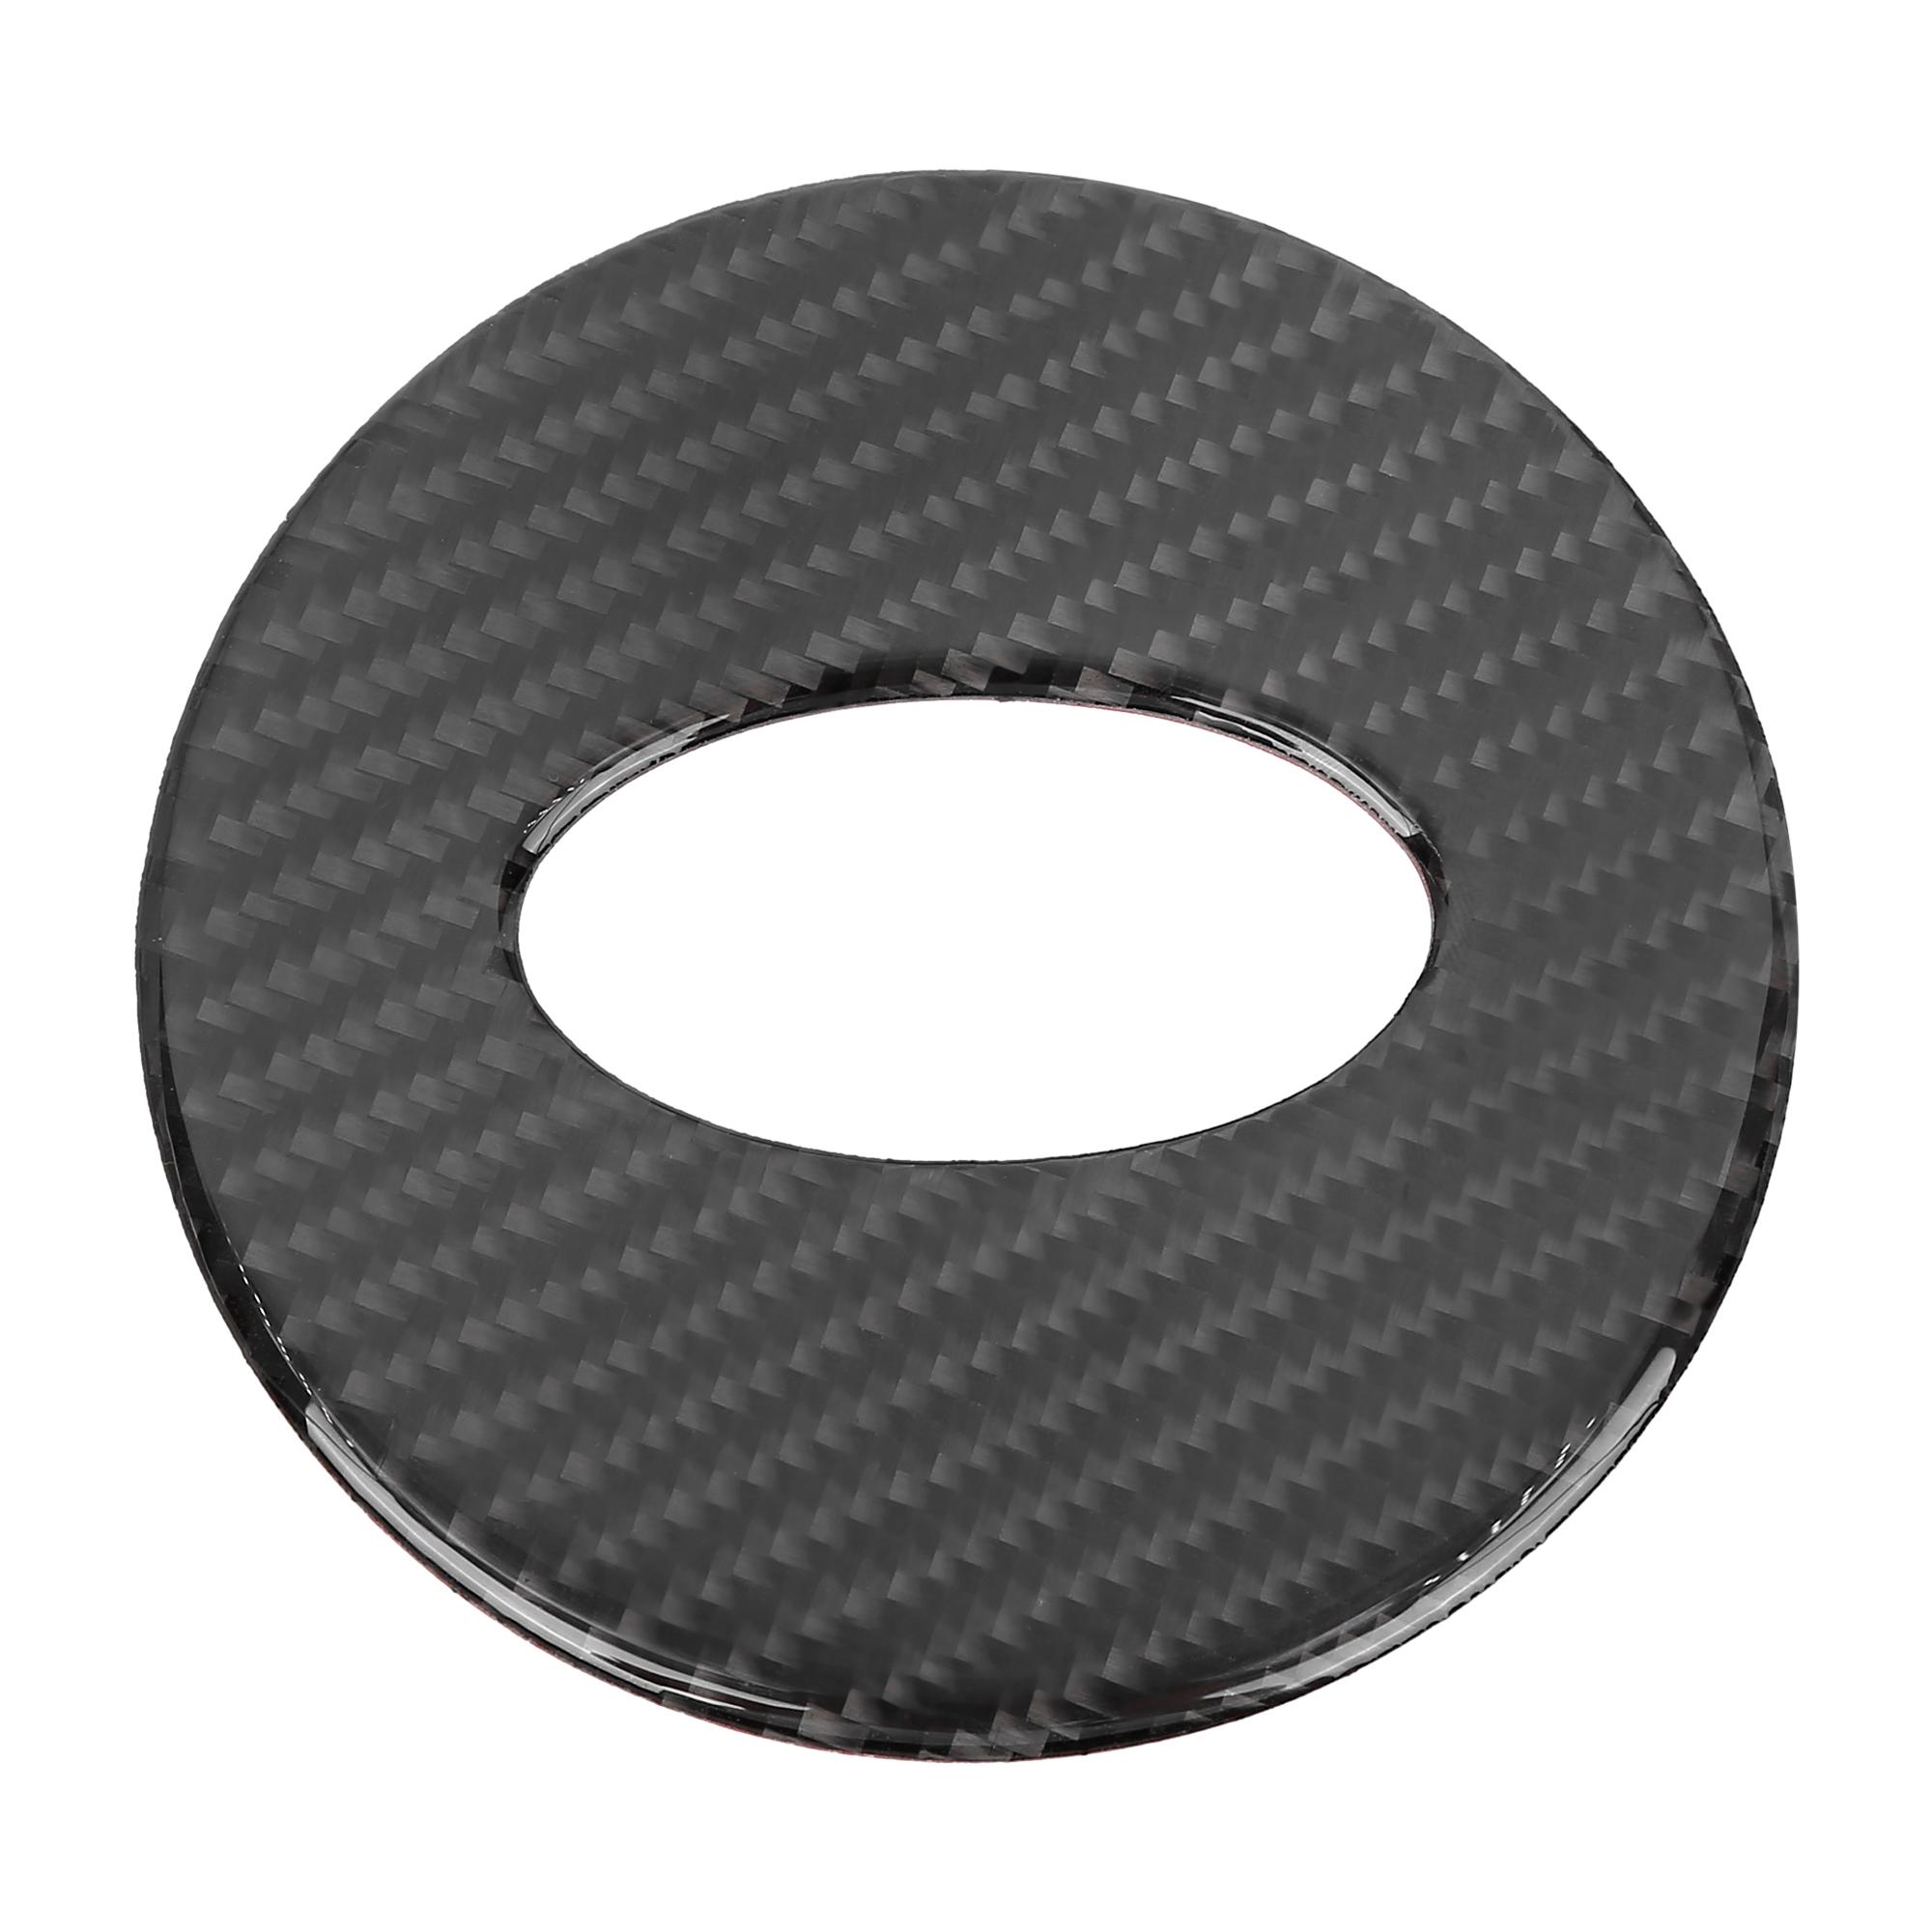 Car Interior Steering Wheel Trim Cover Carbon Fiber Pattern Black for Subaru